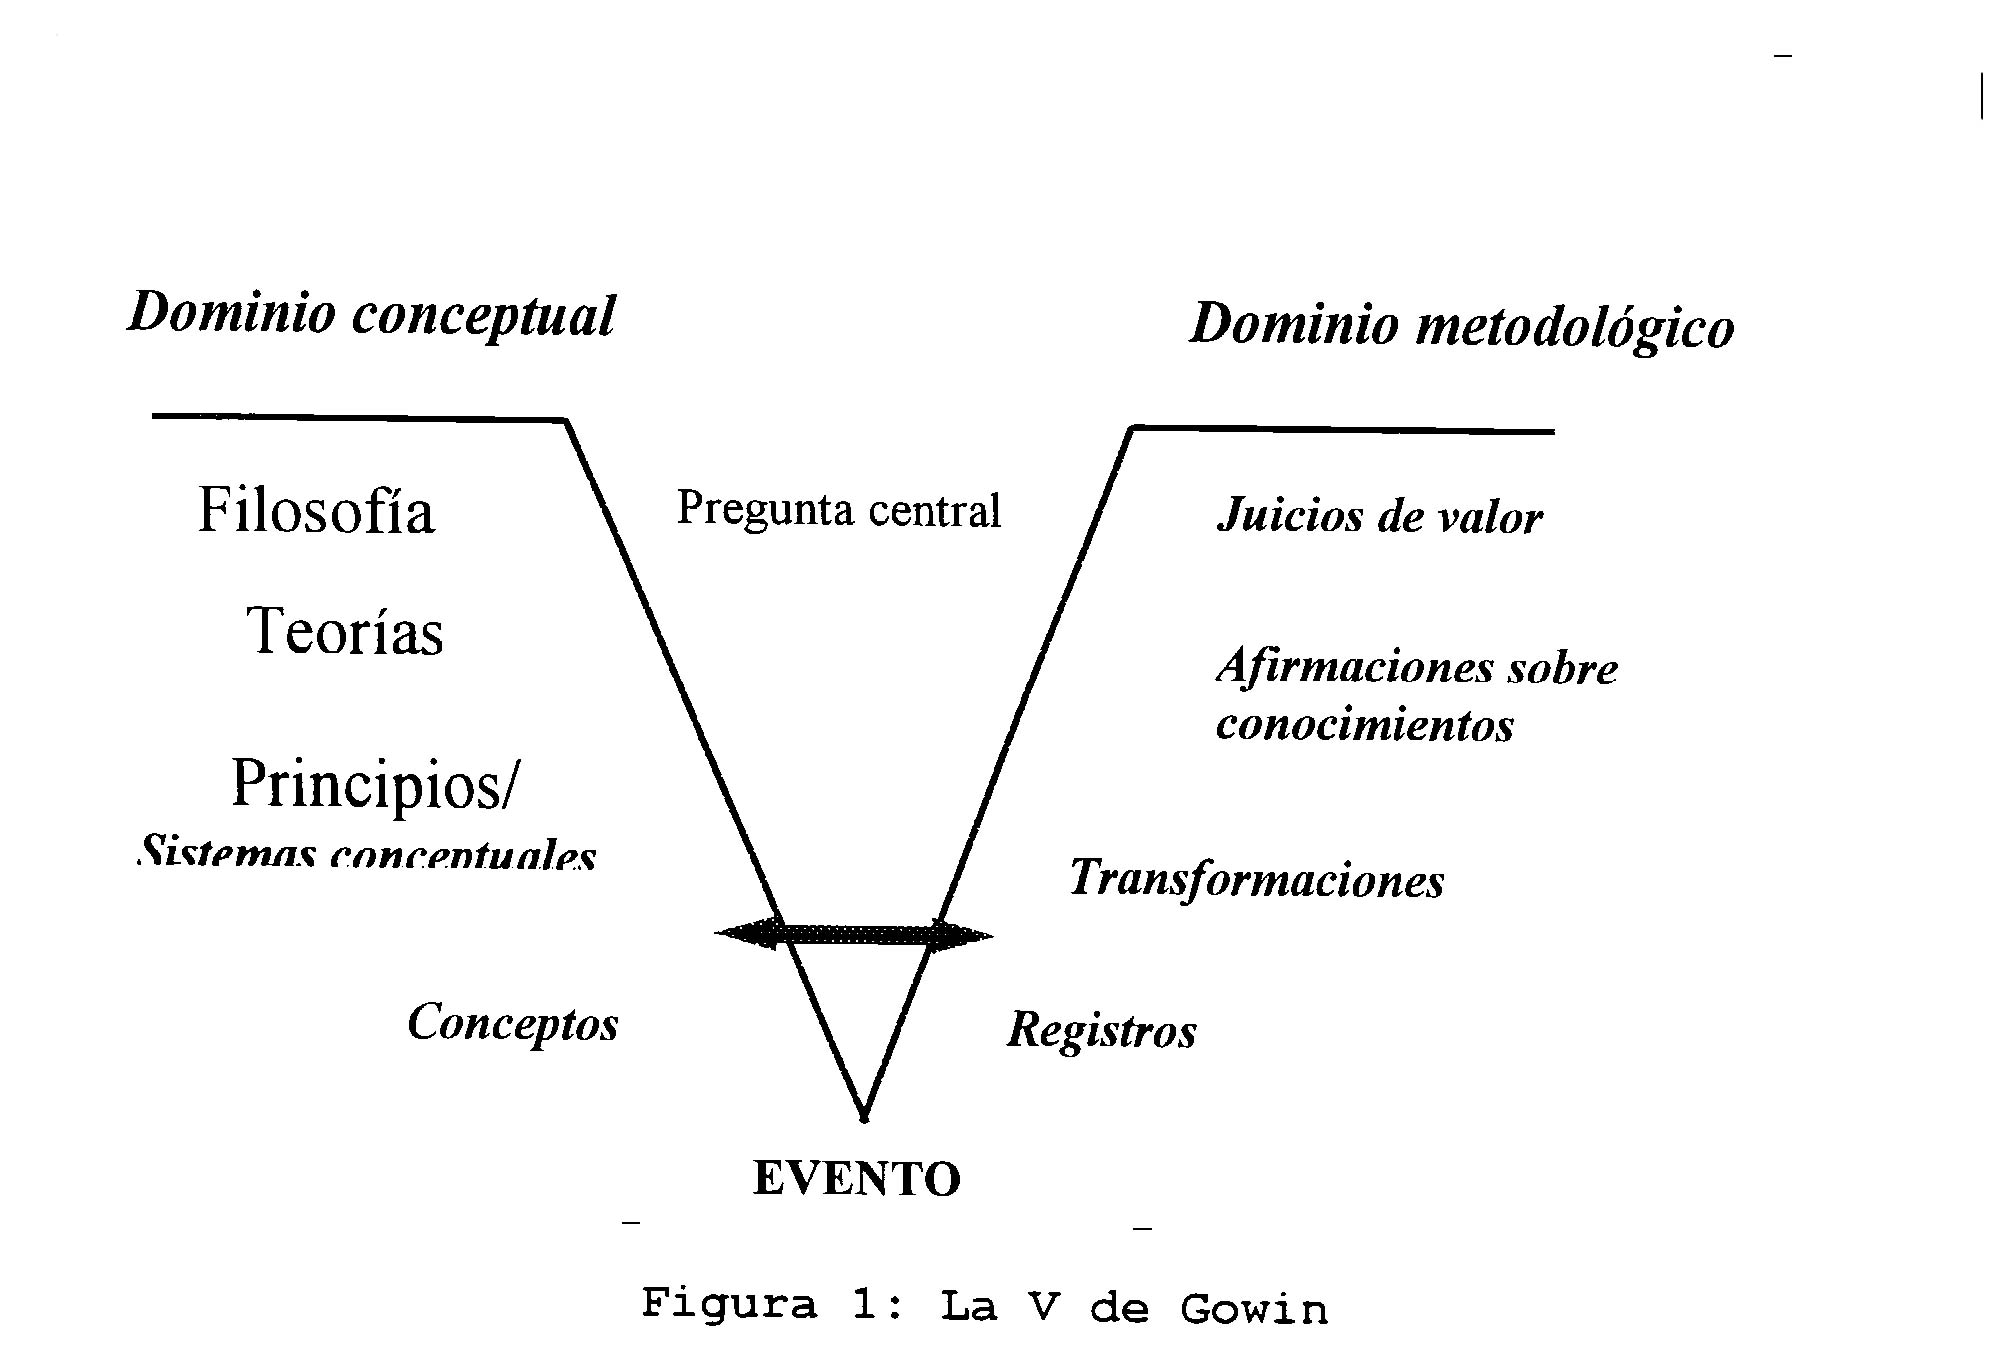 Larkin, j. h. (1979). teaching problem representation and skill